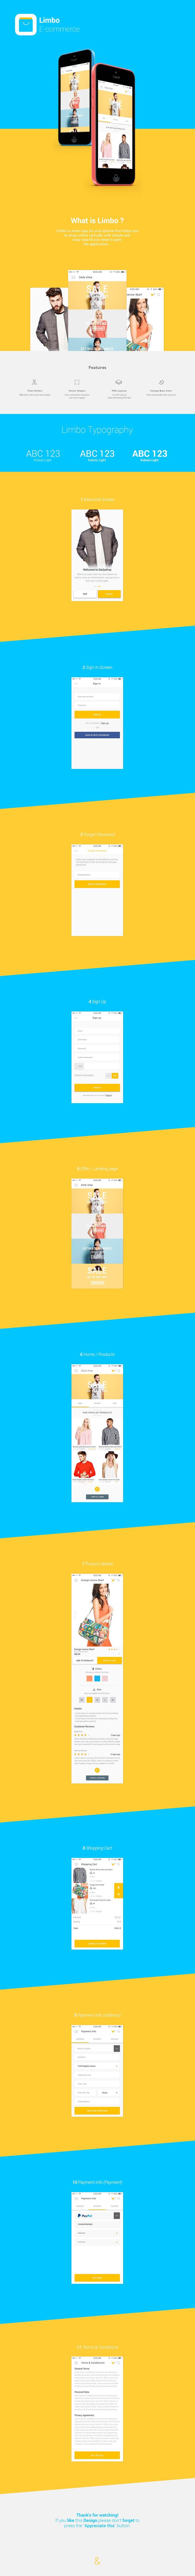 Limbo eCommerce app Design on Behance